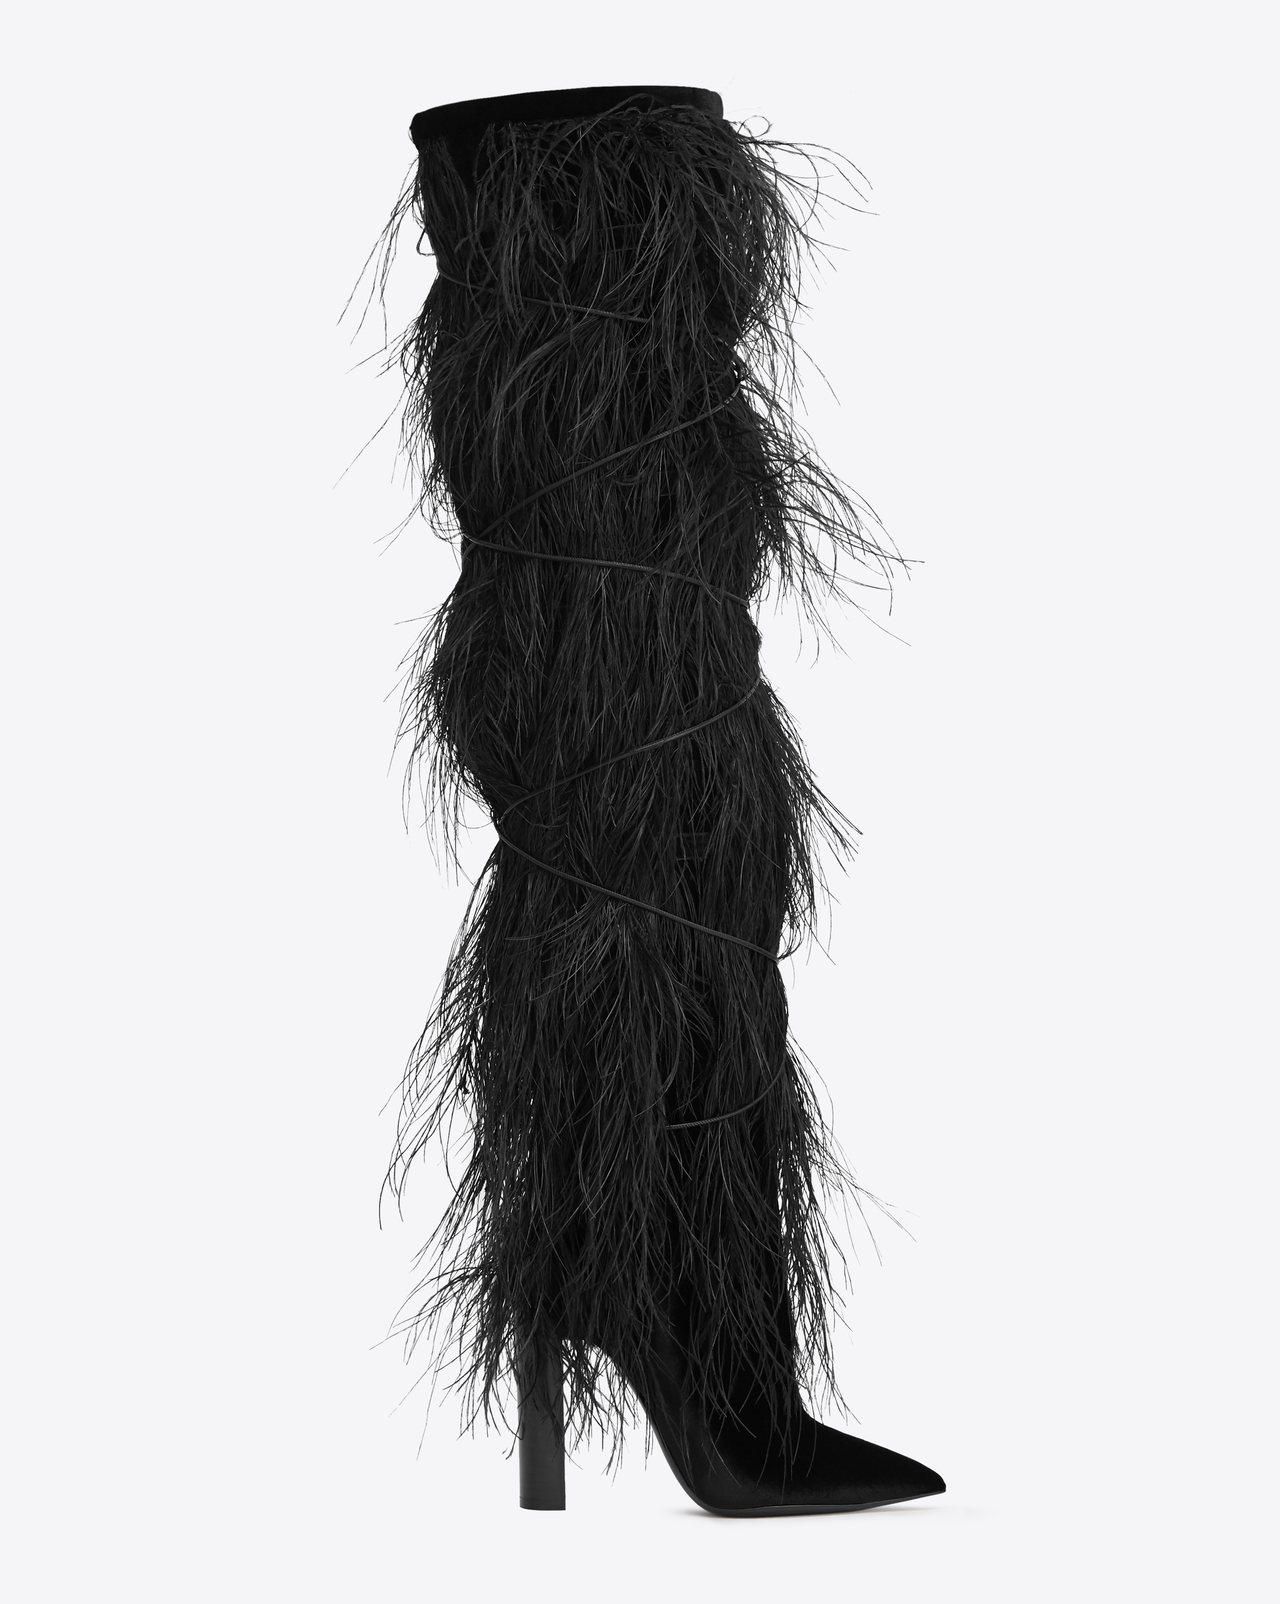 TANGER羽毛黑色絲絨膝上長靴,價格電洽。圖/Saint Laurent提供